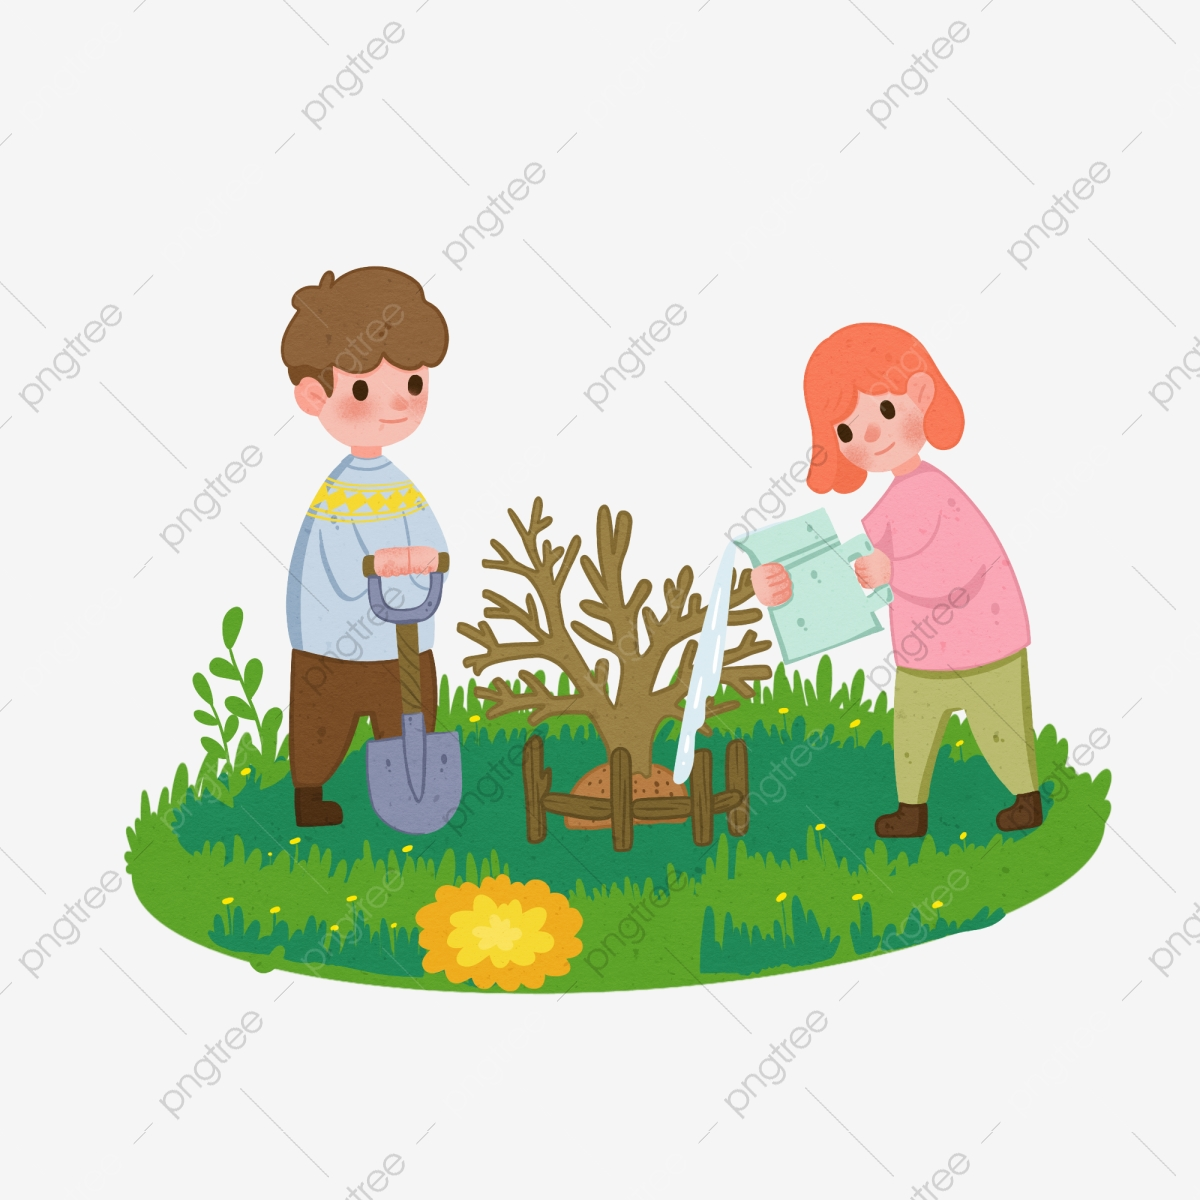 Arbor شخصية اليوم تصوير إبنة شجرة الزراعة العشب الأخضر رسم كاريكتوري شجرة الطفل سقي وسام النبات طفل يزرع شجرة في الشجرة شجرة Png وملف Psd للتحميل مجانا